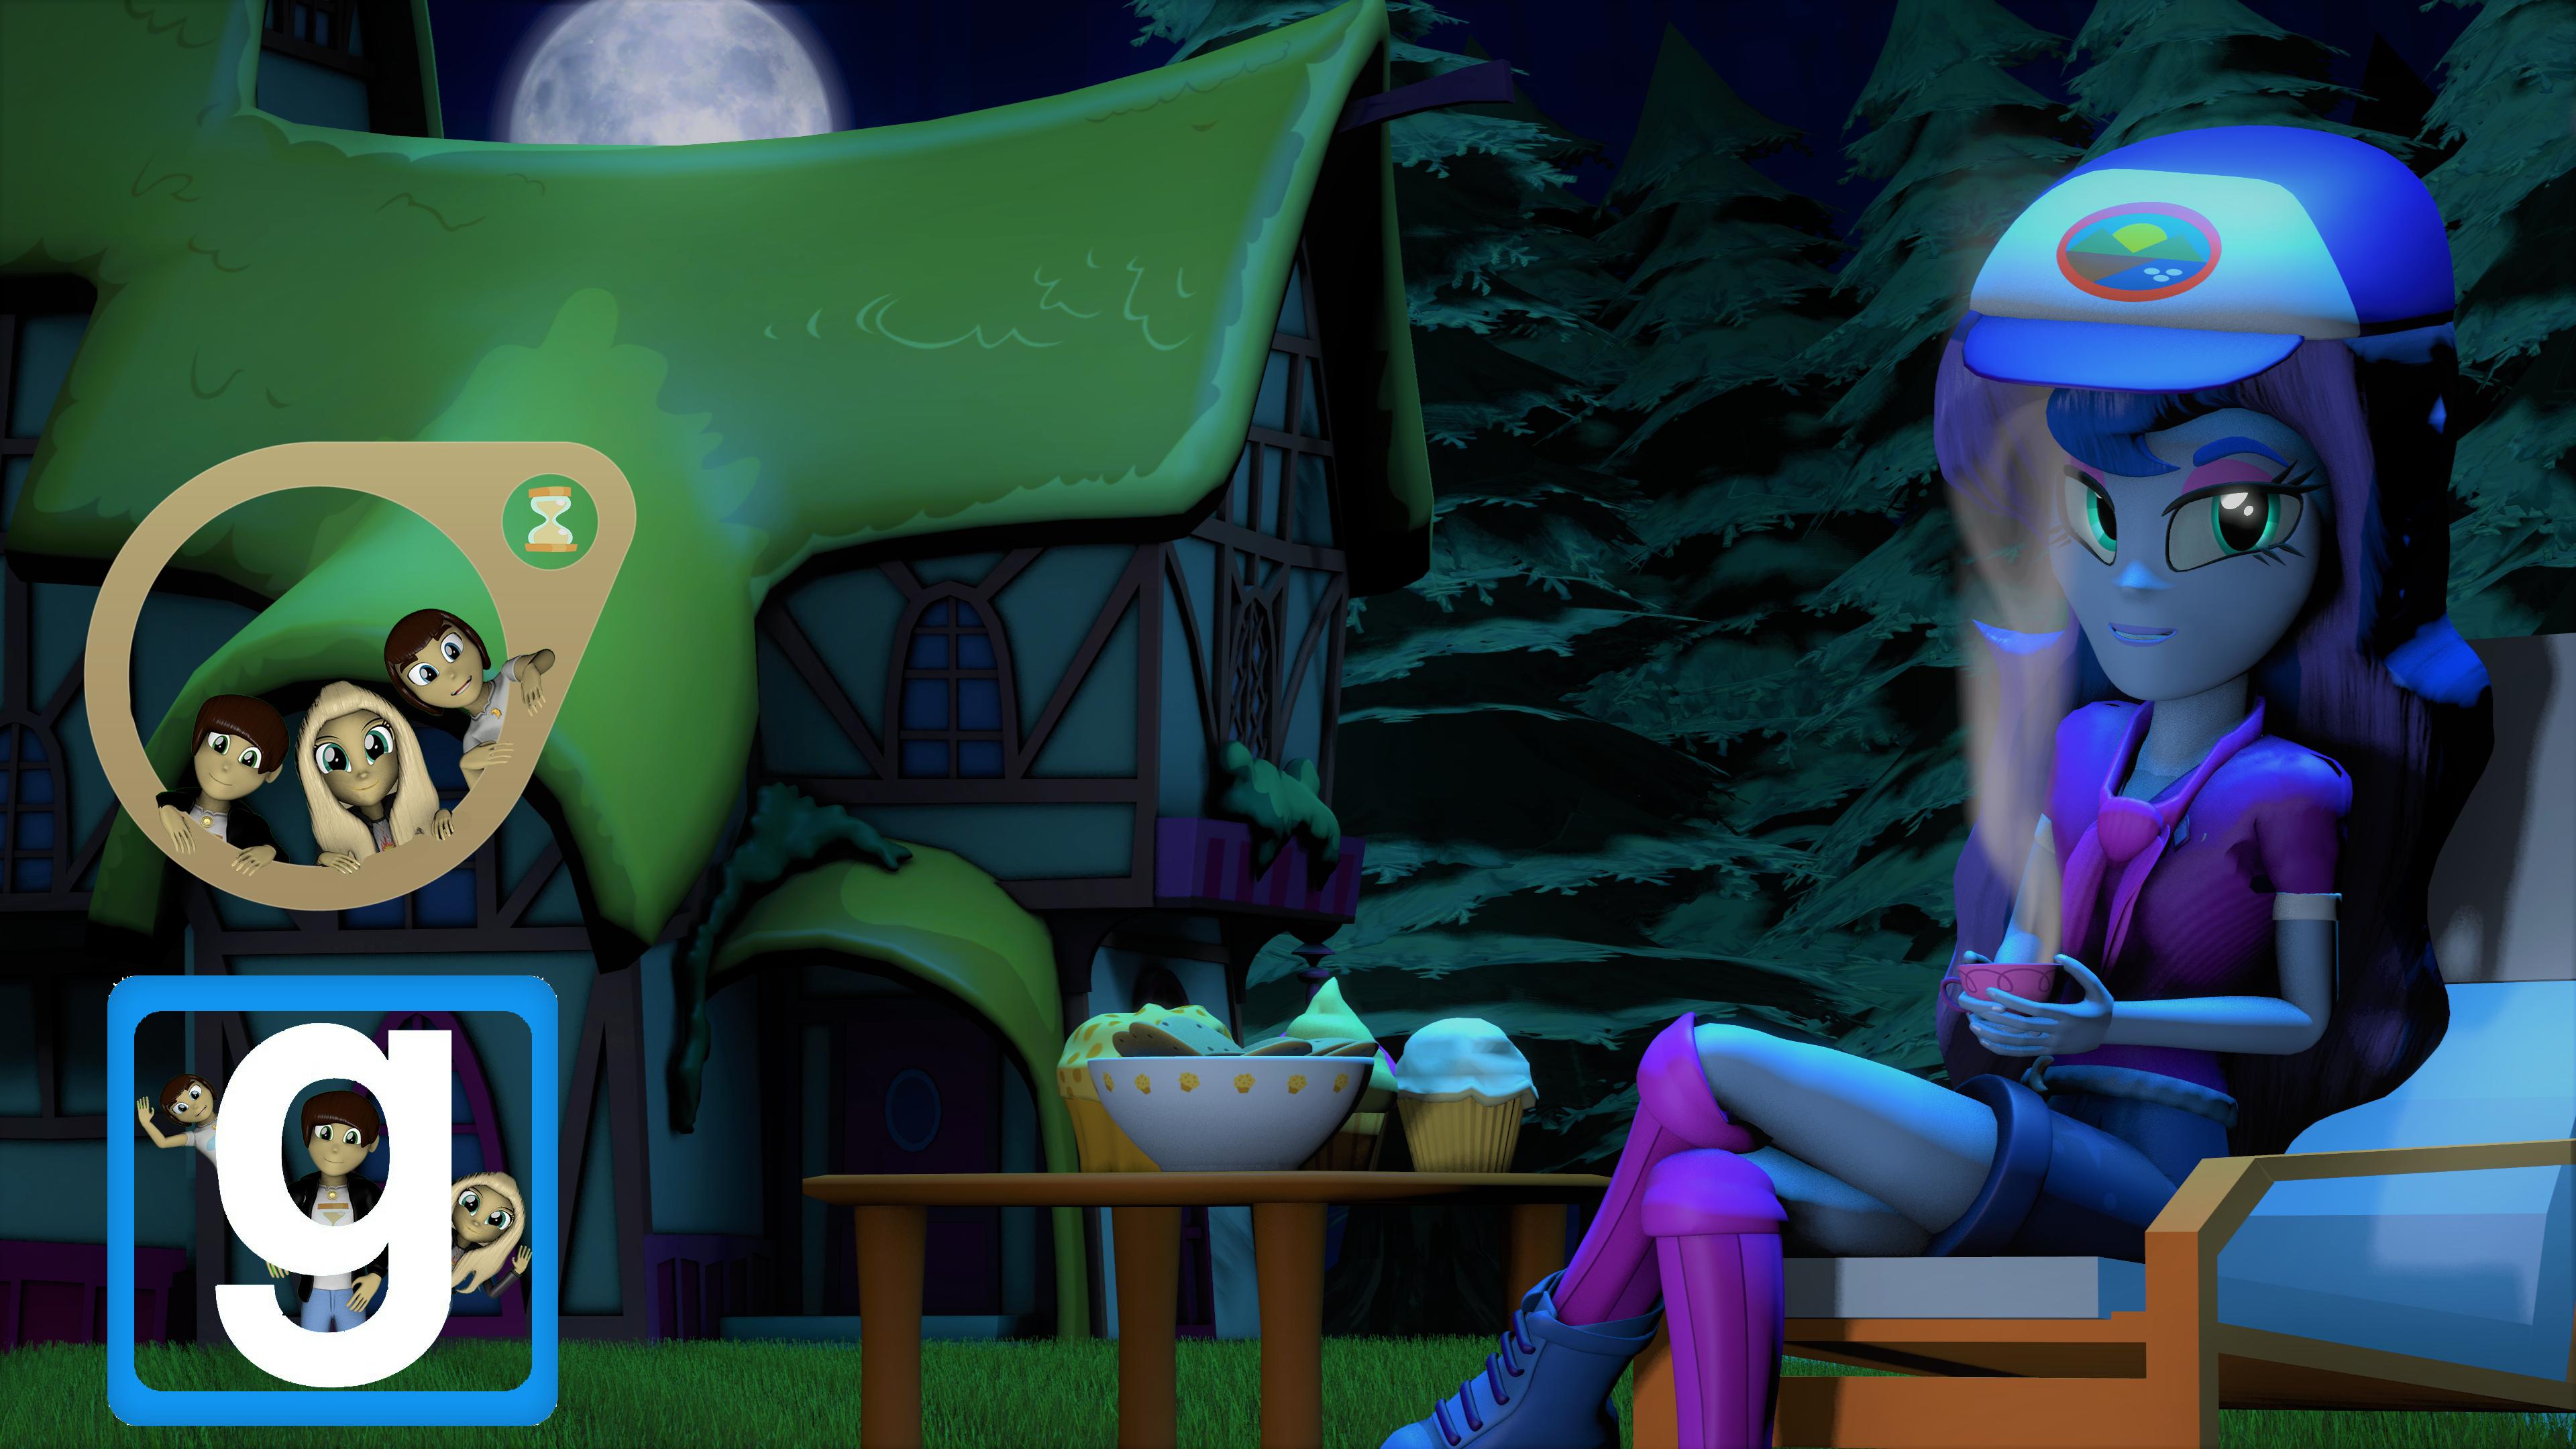 [EQG] Camper Vice Principal Luna [SFM] [Gmod] by EmpireOfTime